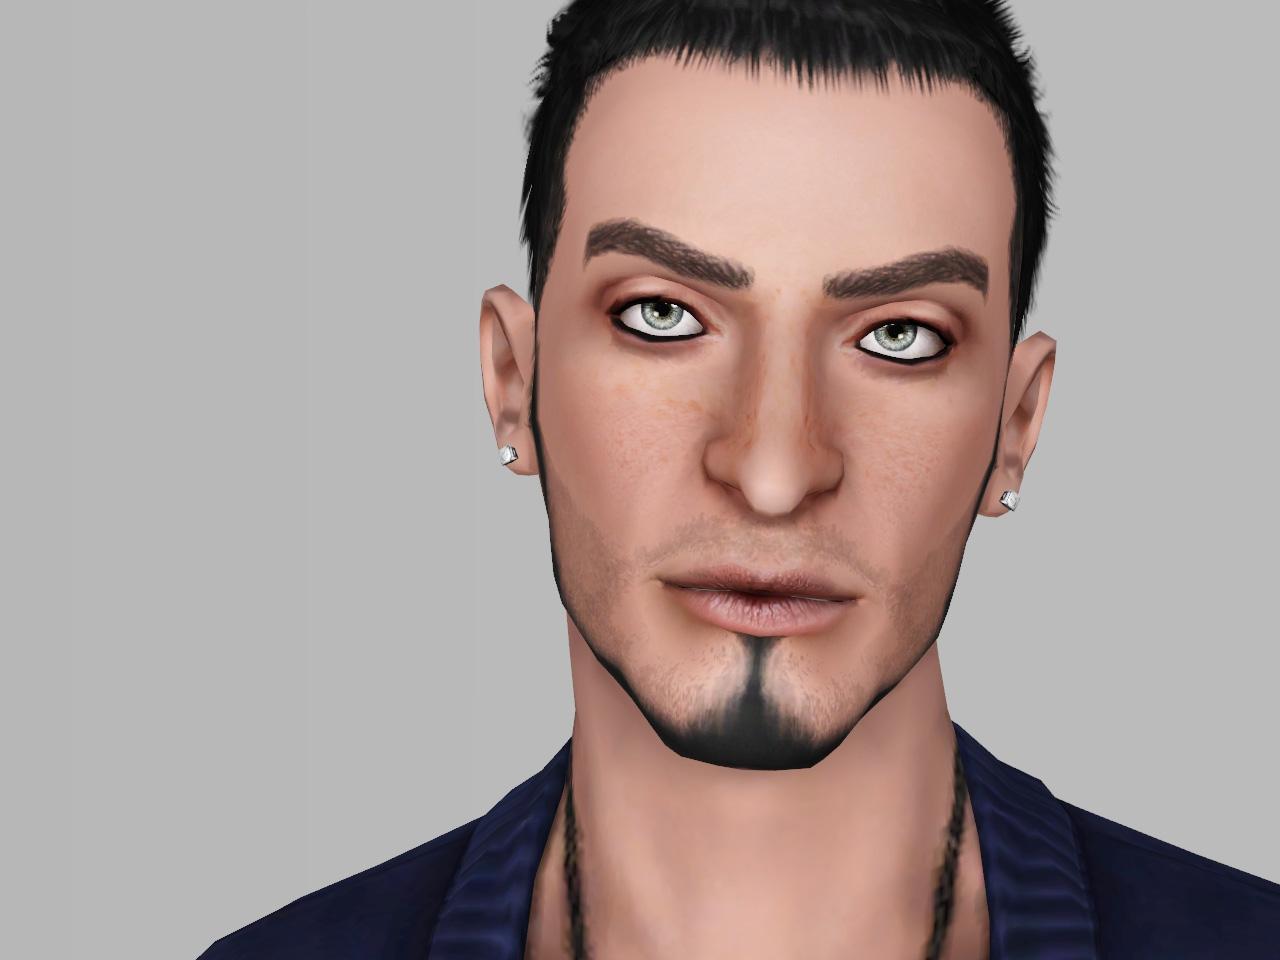 Mod The Sims - Fadil Görkem